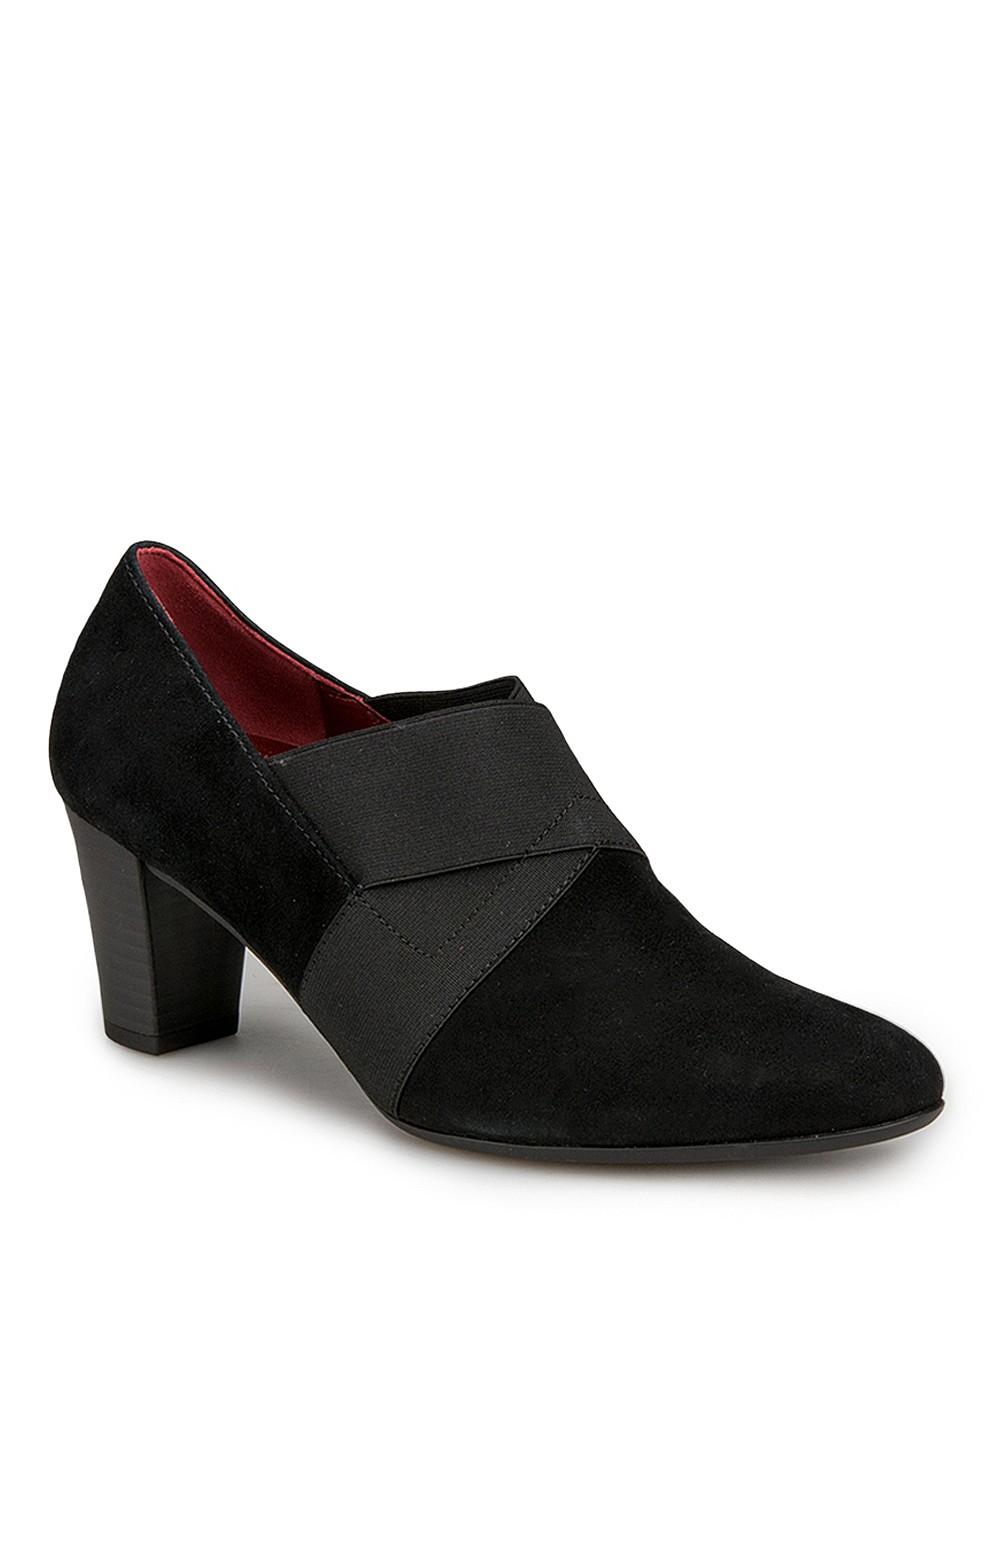 f2a9b99d7ac10 Ladies Gabor Elasticated Trouser Shoe - House of Bruar